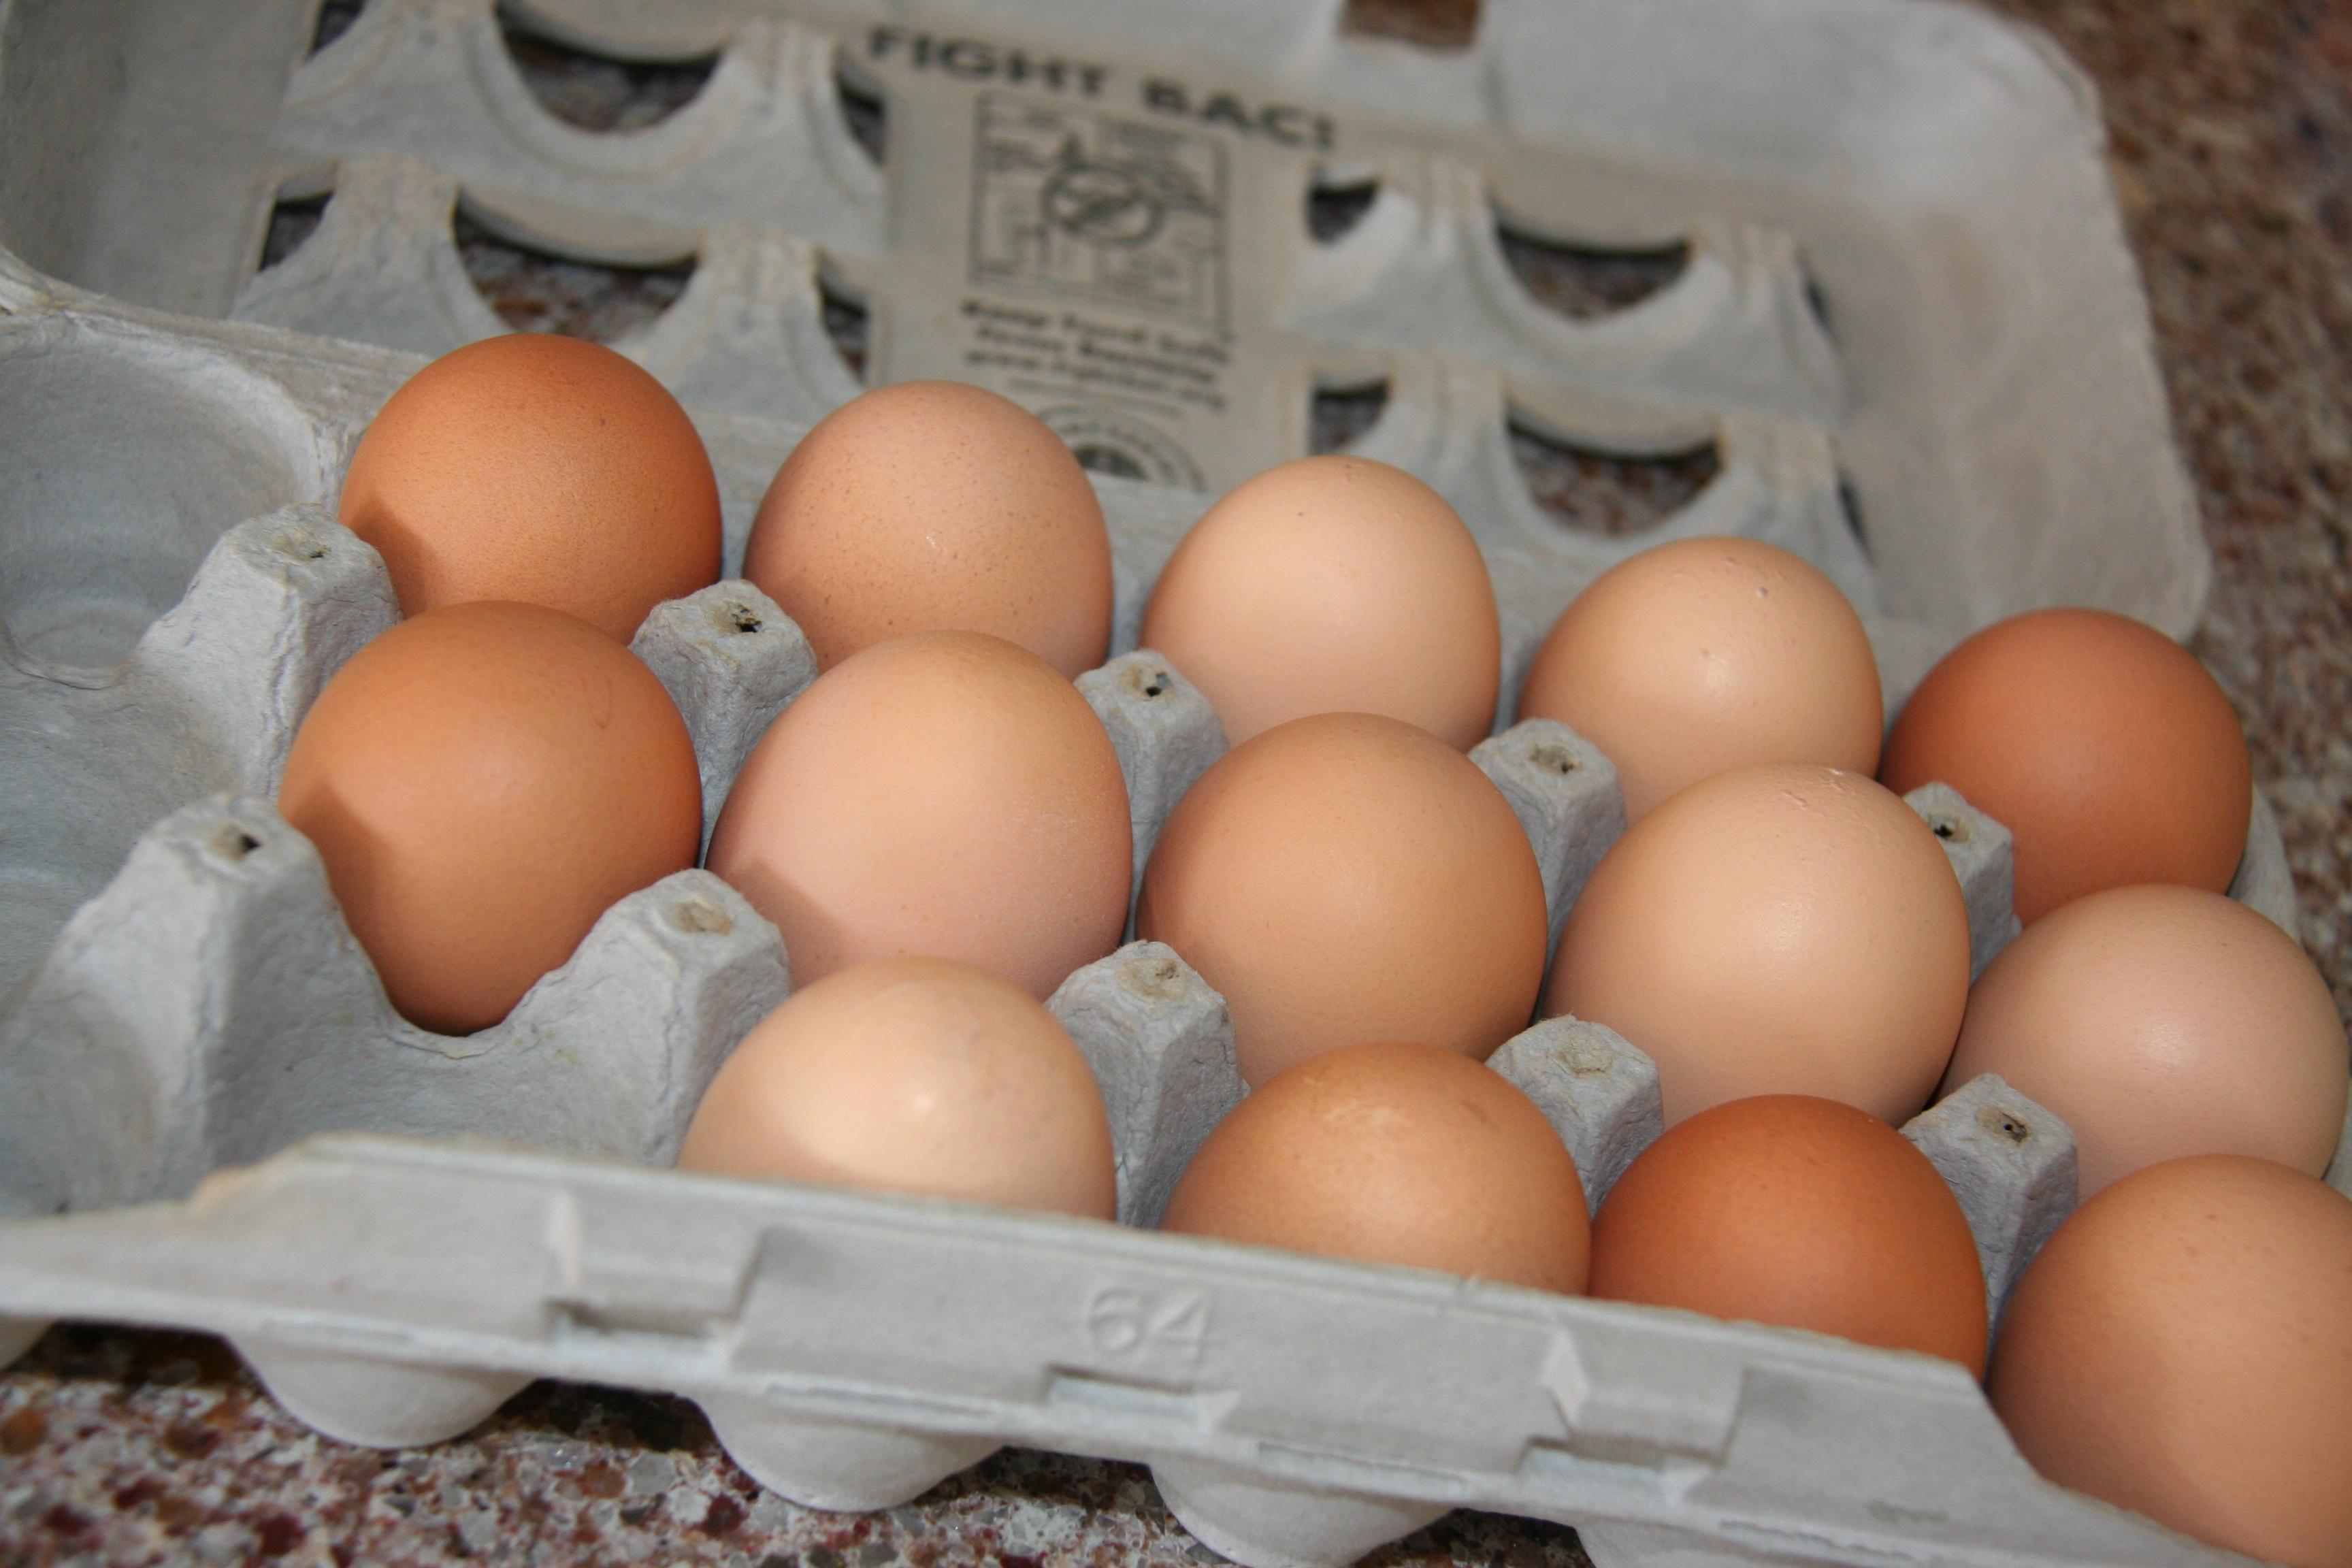 Fresh eggs from backyard chickens - Simply Preparing